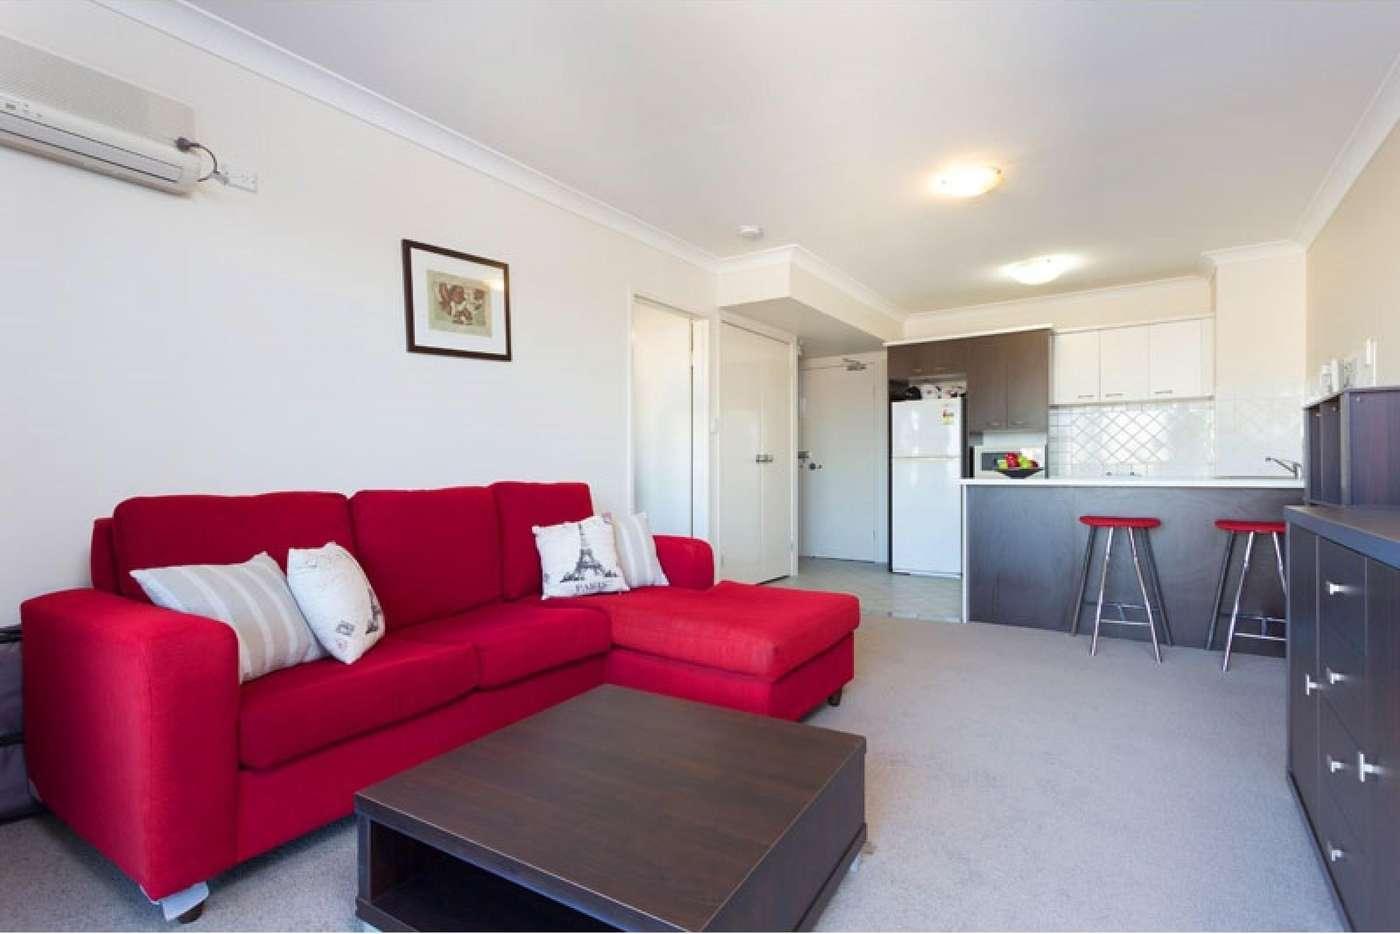 Main view of Homely apartment listing, 265/35 Morrow Street, Taringa QLD 4068